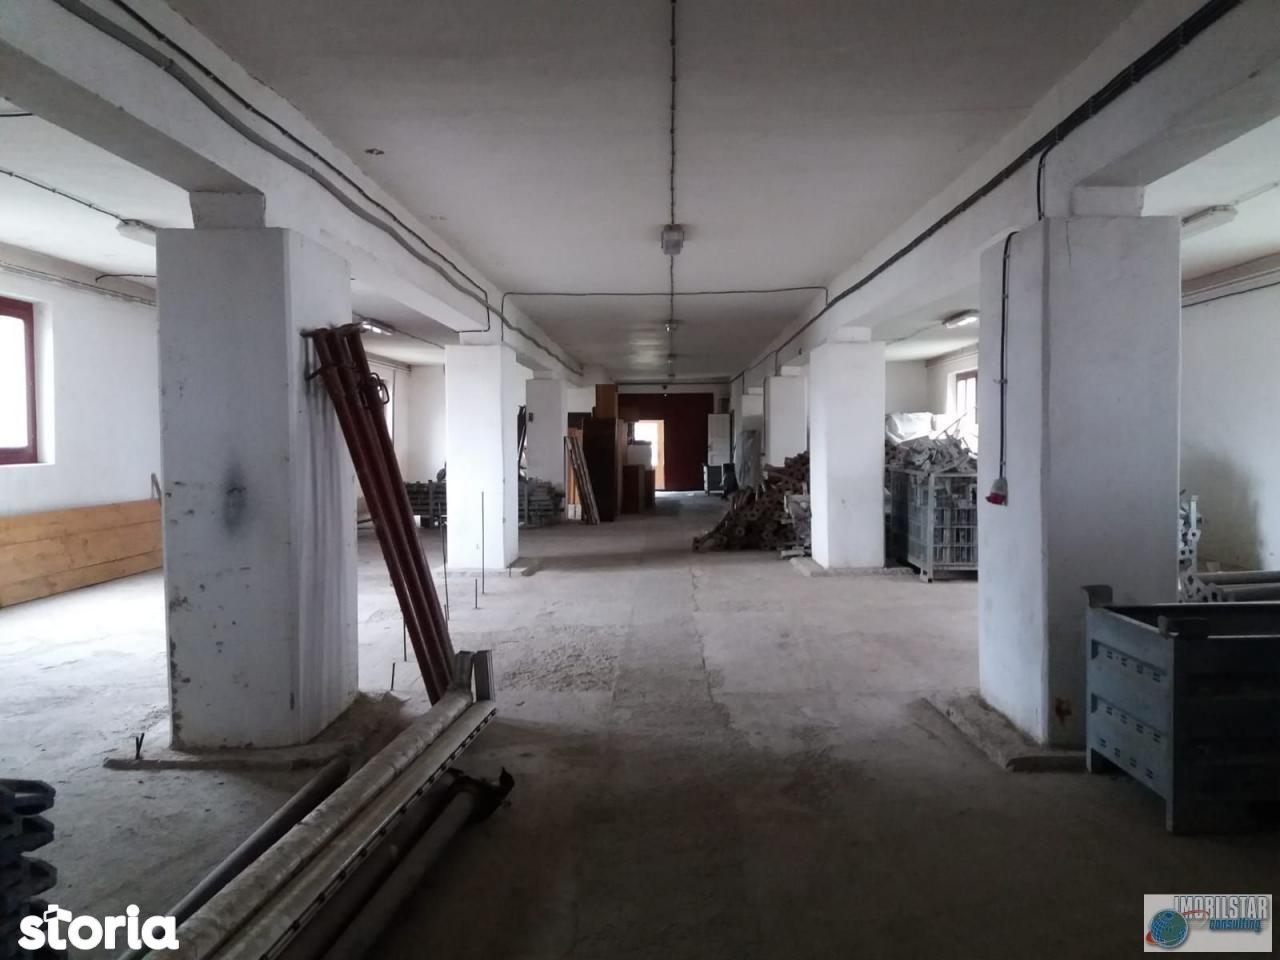 Spatiu Comercial de inchiriat, Mureș (judet), Târgu Mureş - Foto 4